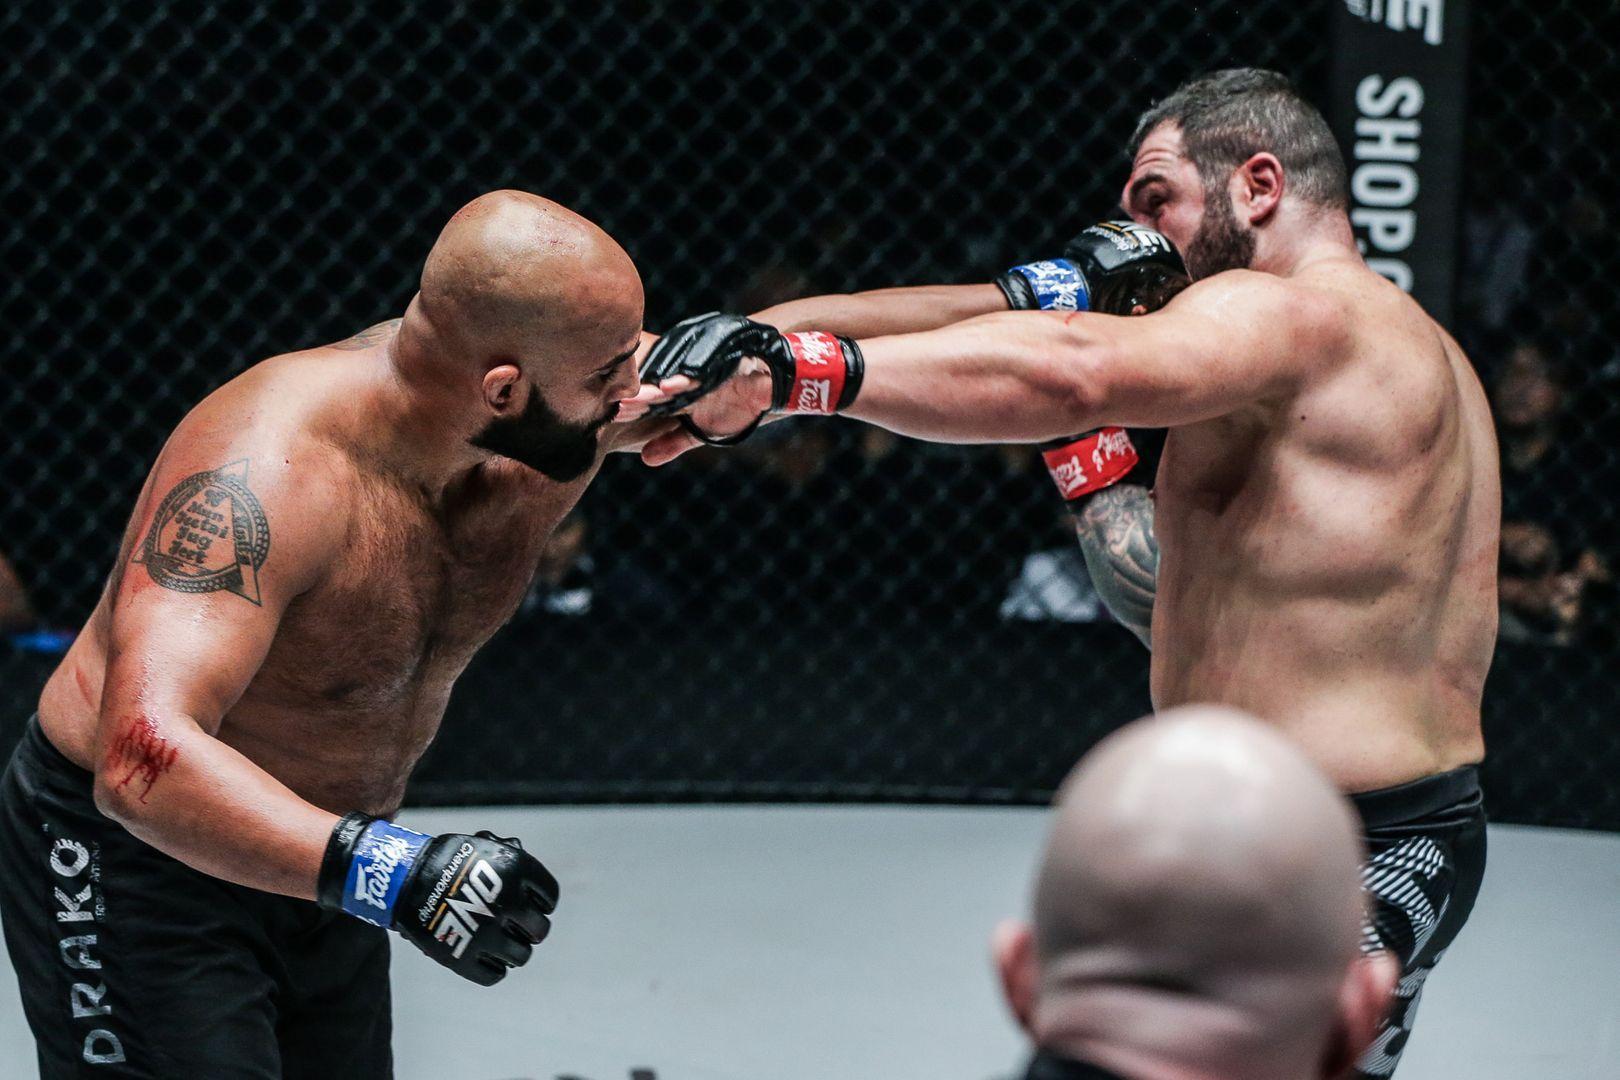 Arjan Bhullar attacks Mauro Cerilli at ONE CENTURY